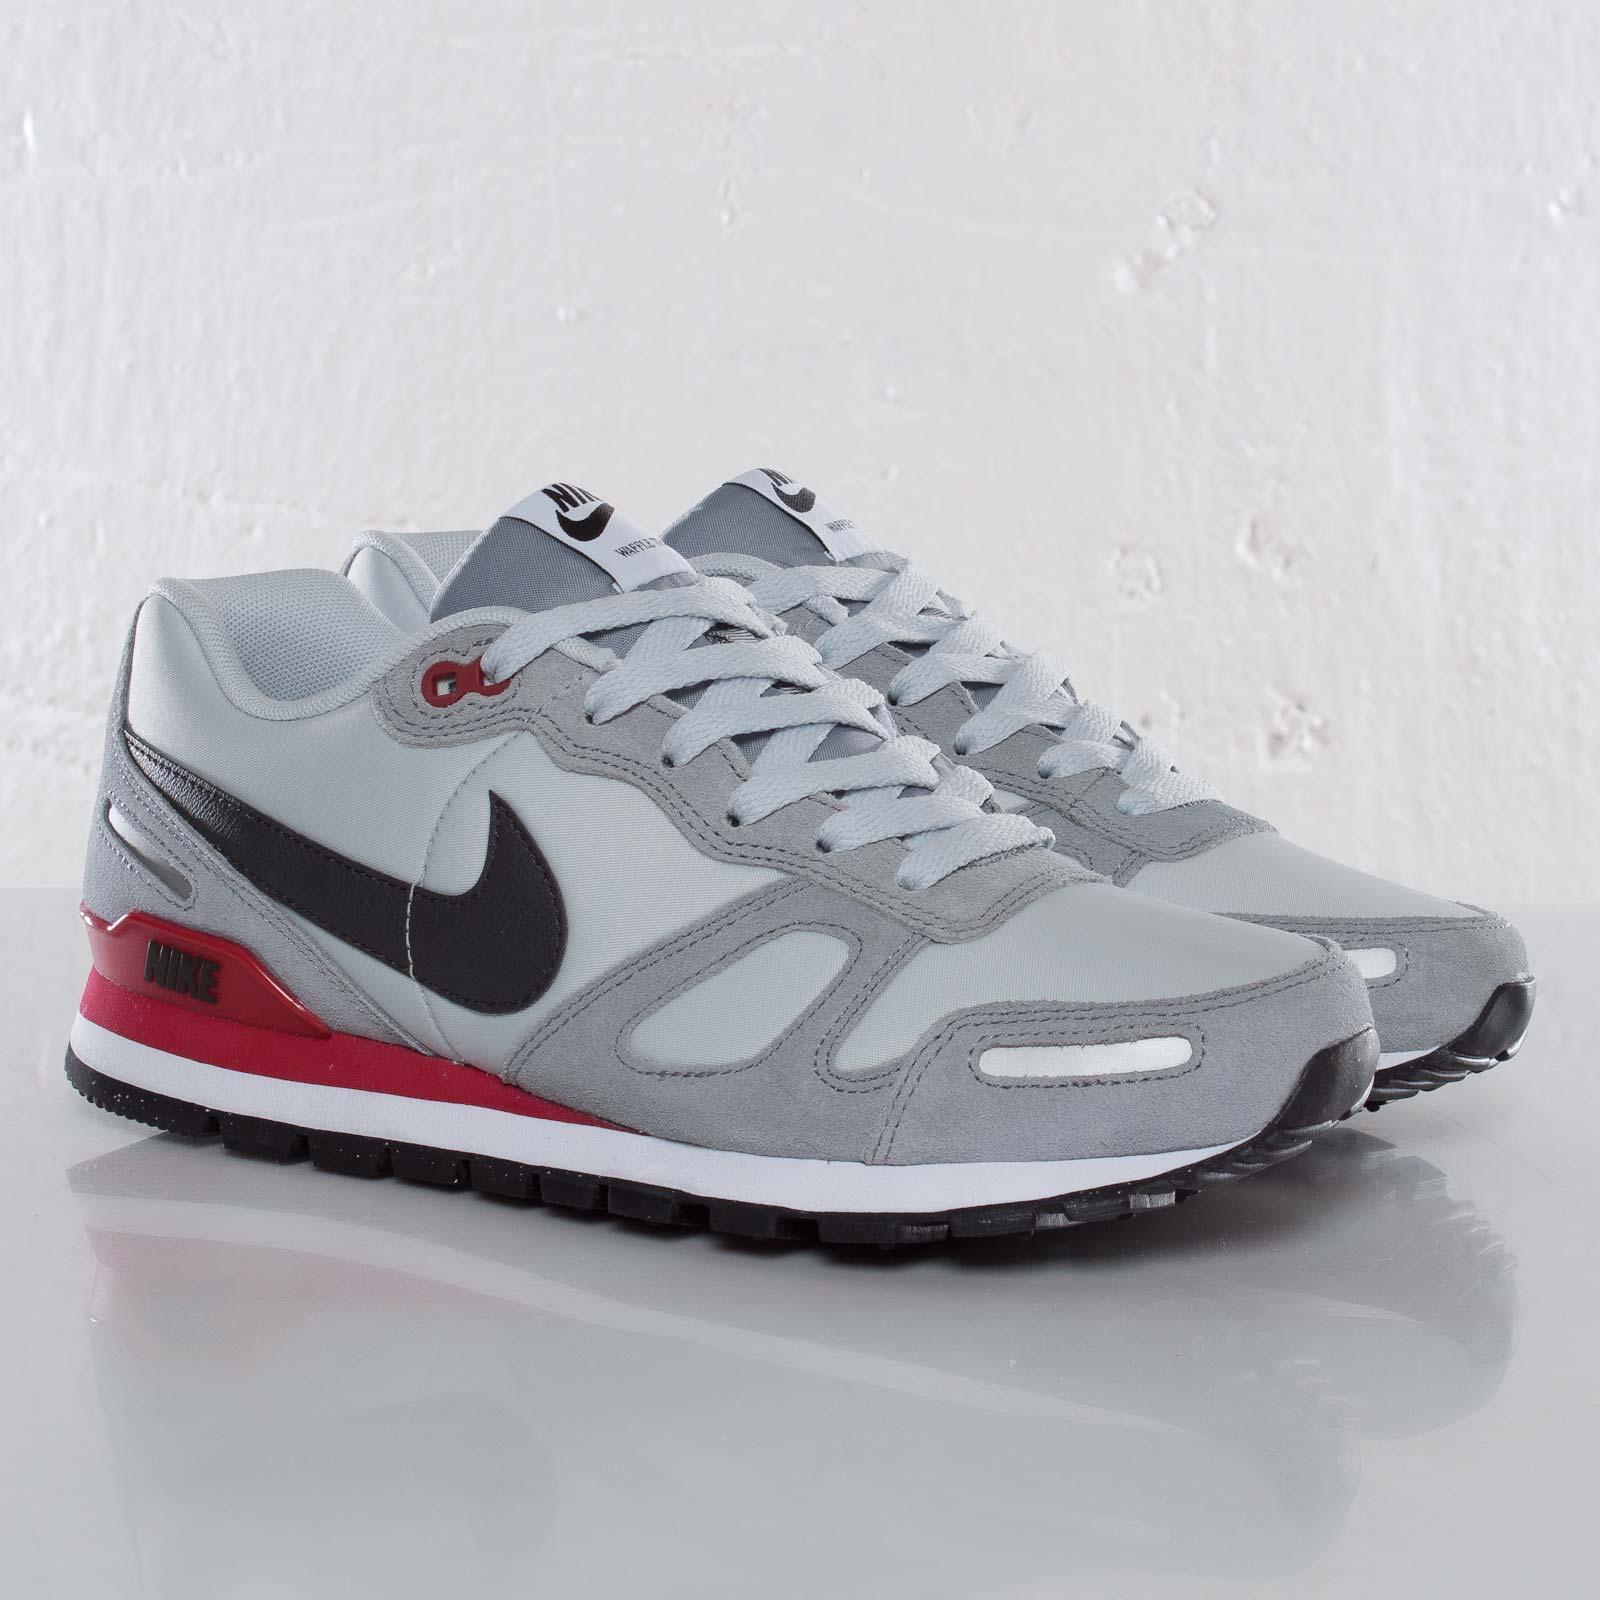 c18ff42548f Nike Air Waffle Trainer - 429628-013 - Sneakersnstuff